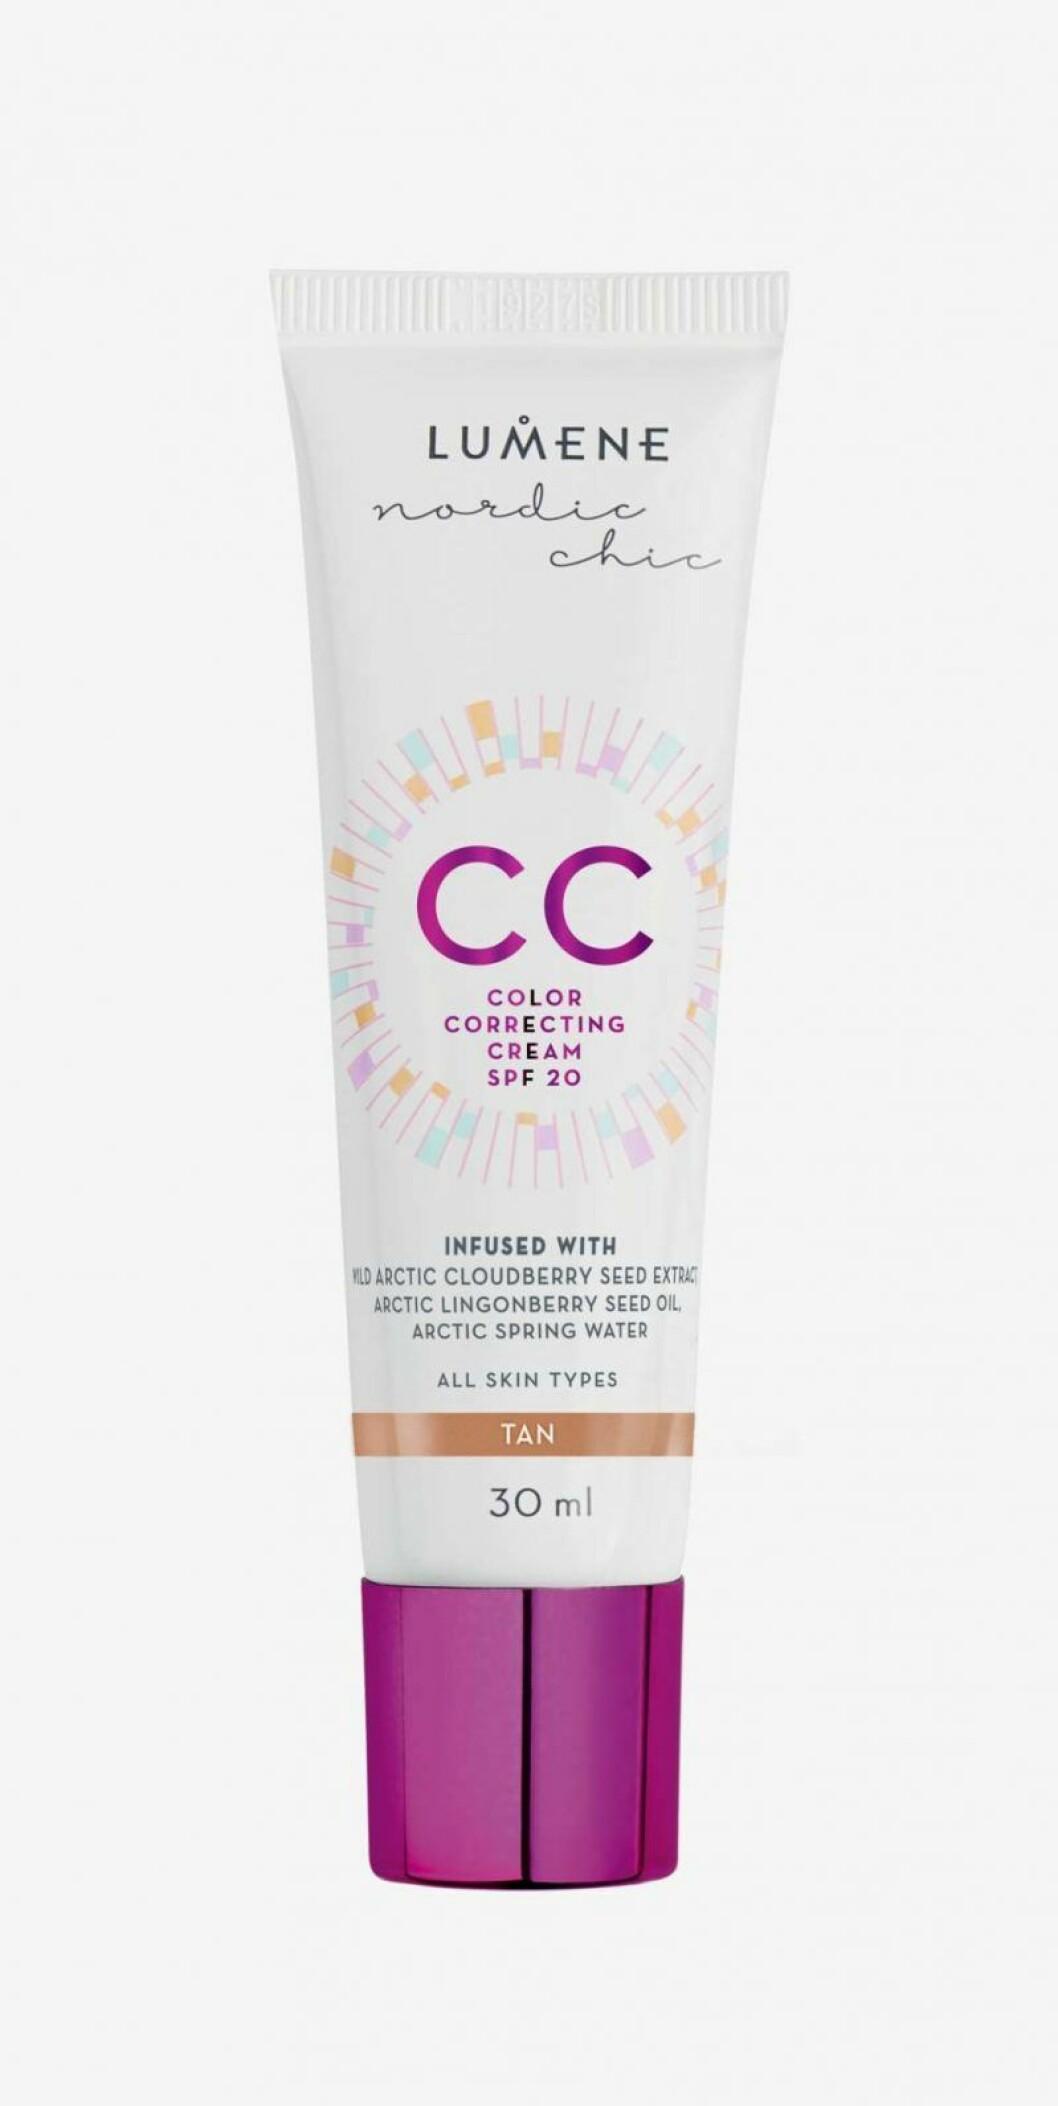 CC color correcting cream från Lumene.